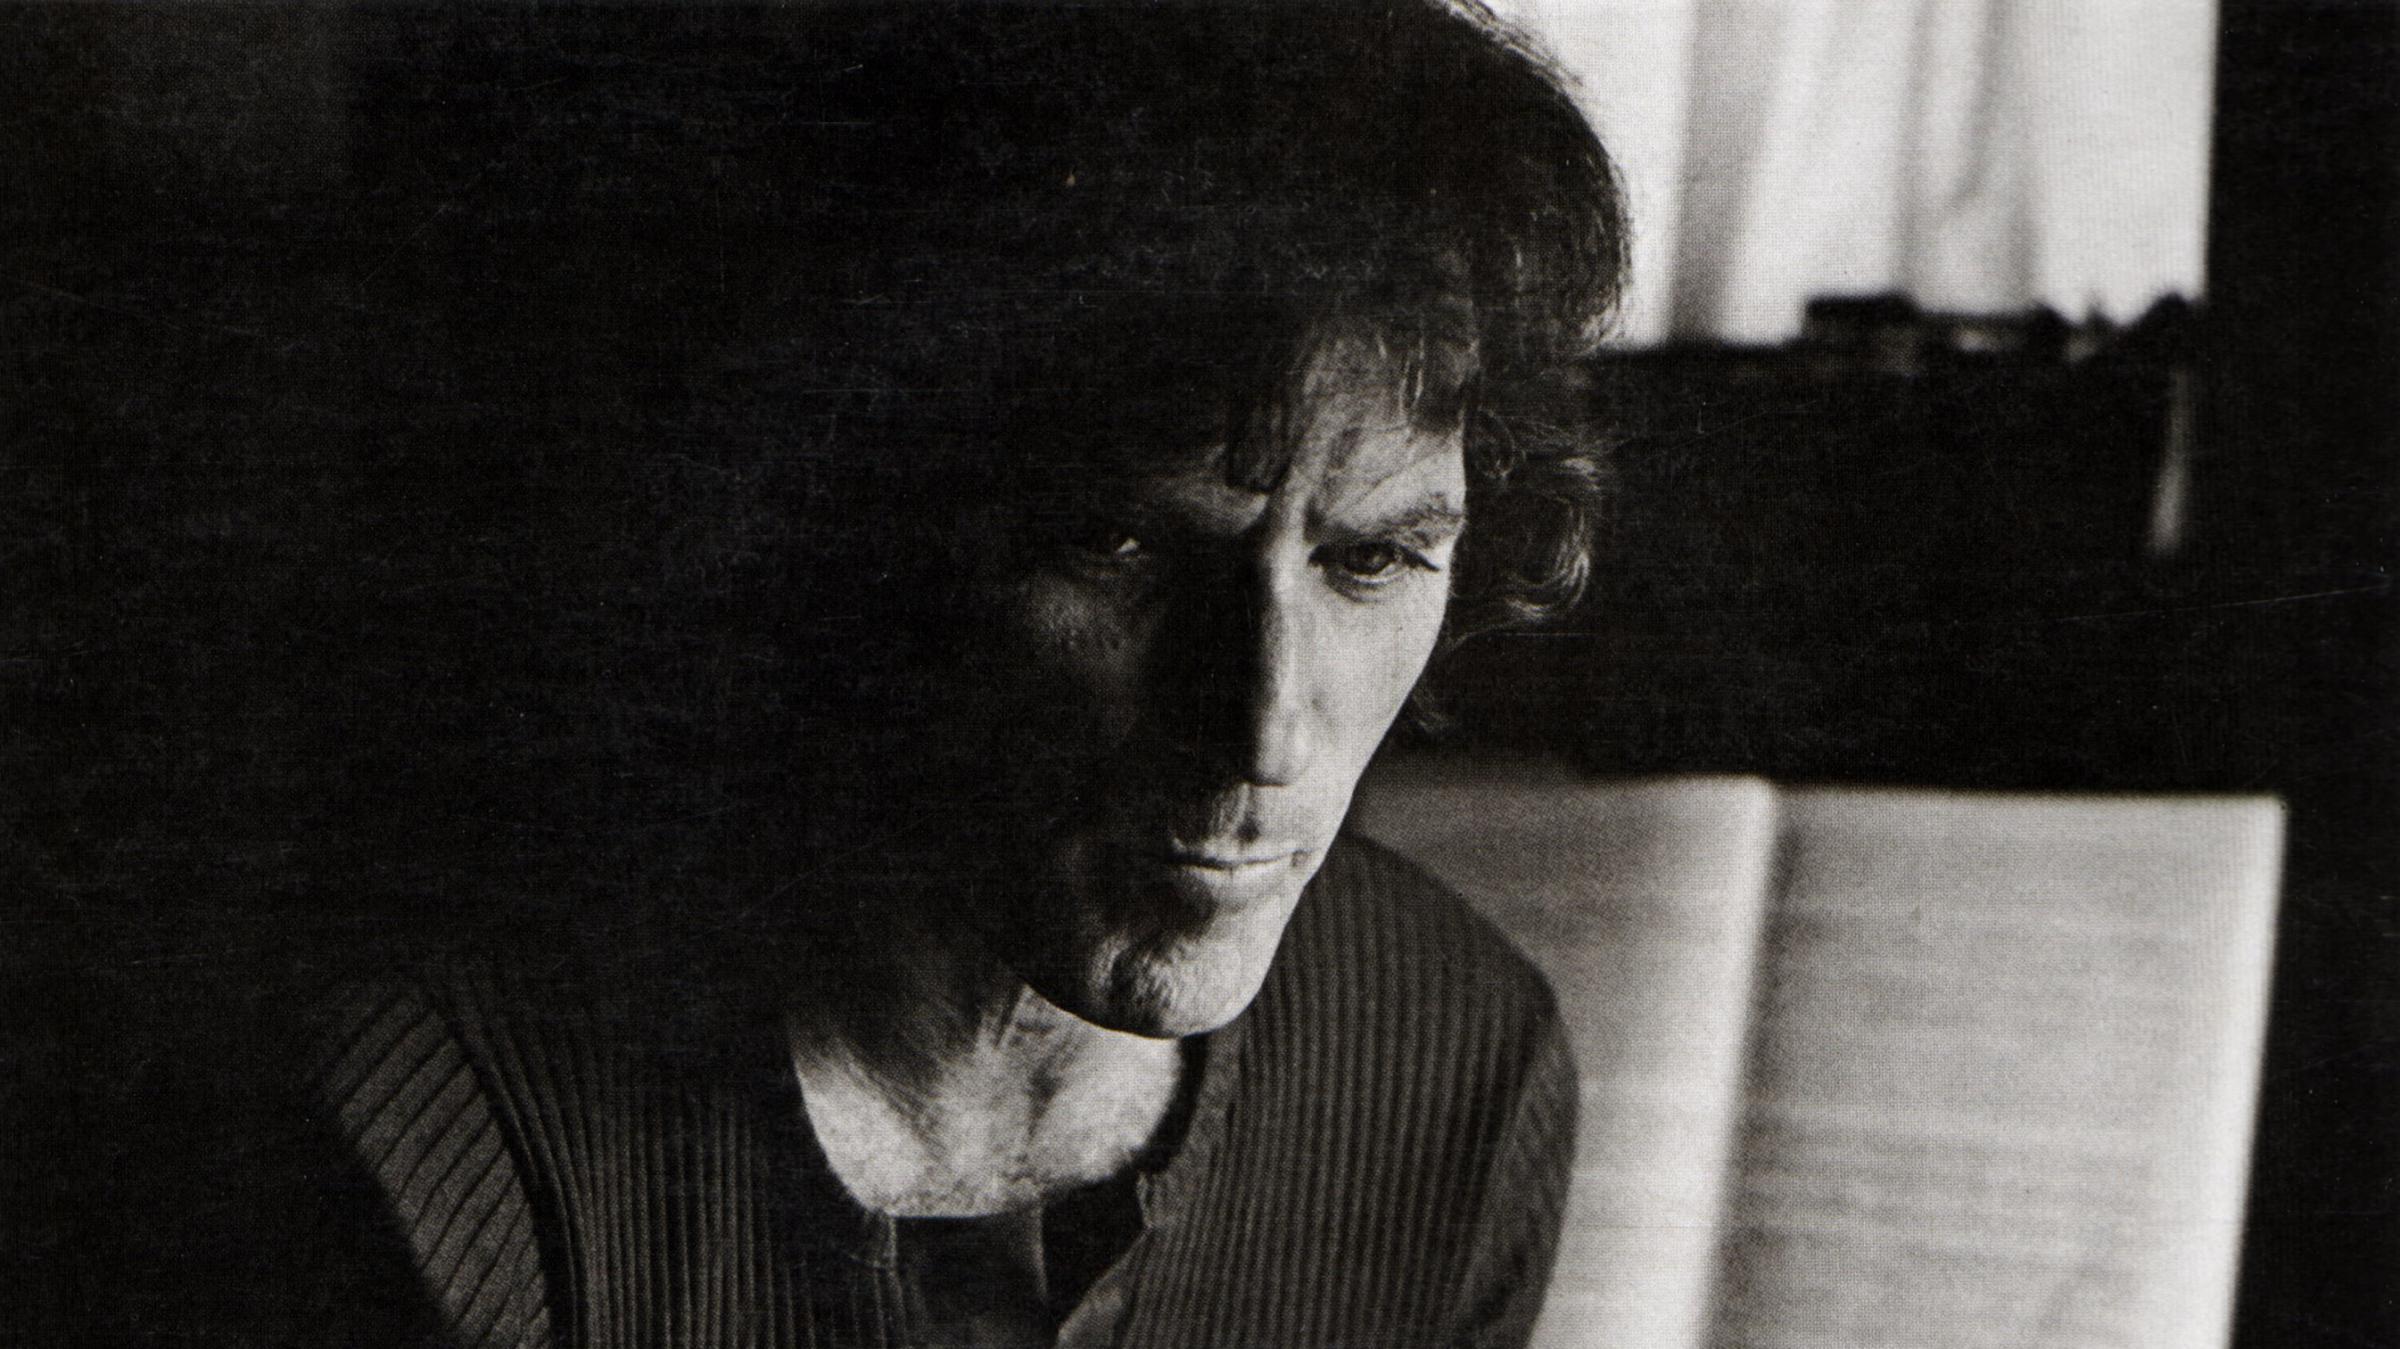 David Axelrod, Musical Visionary And Historical Propellant